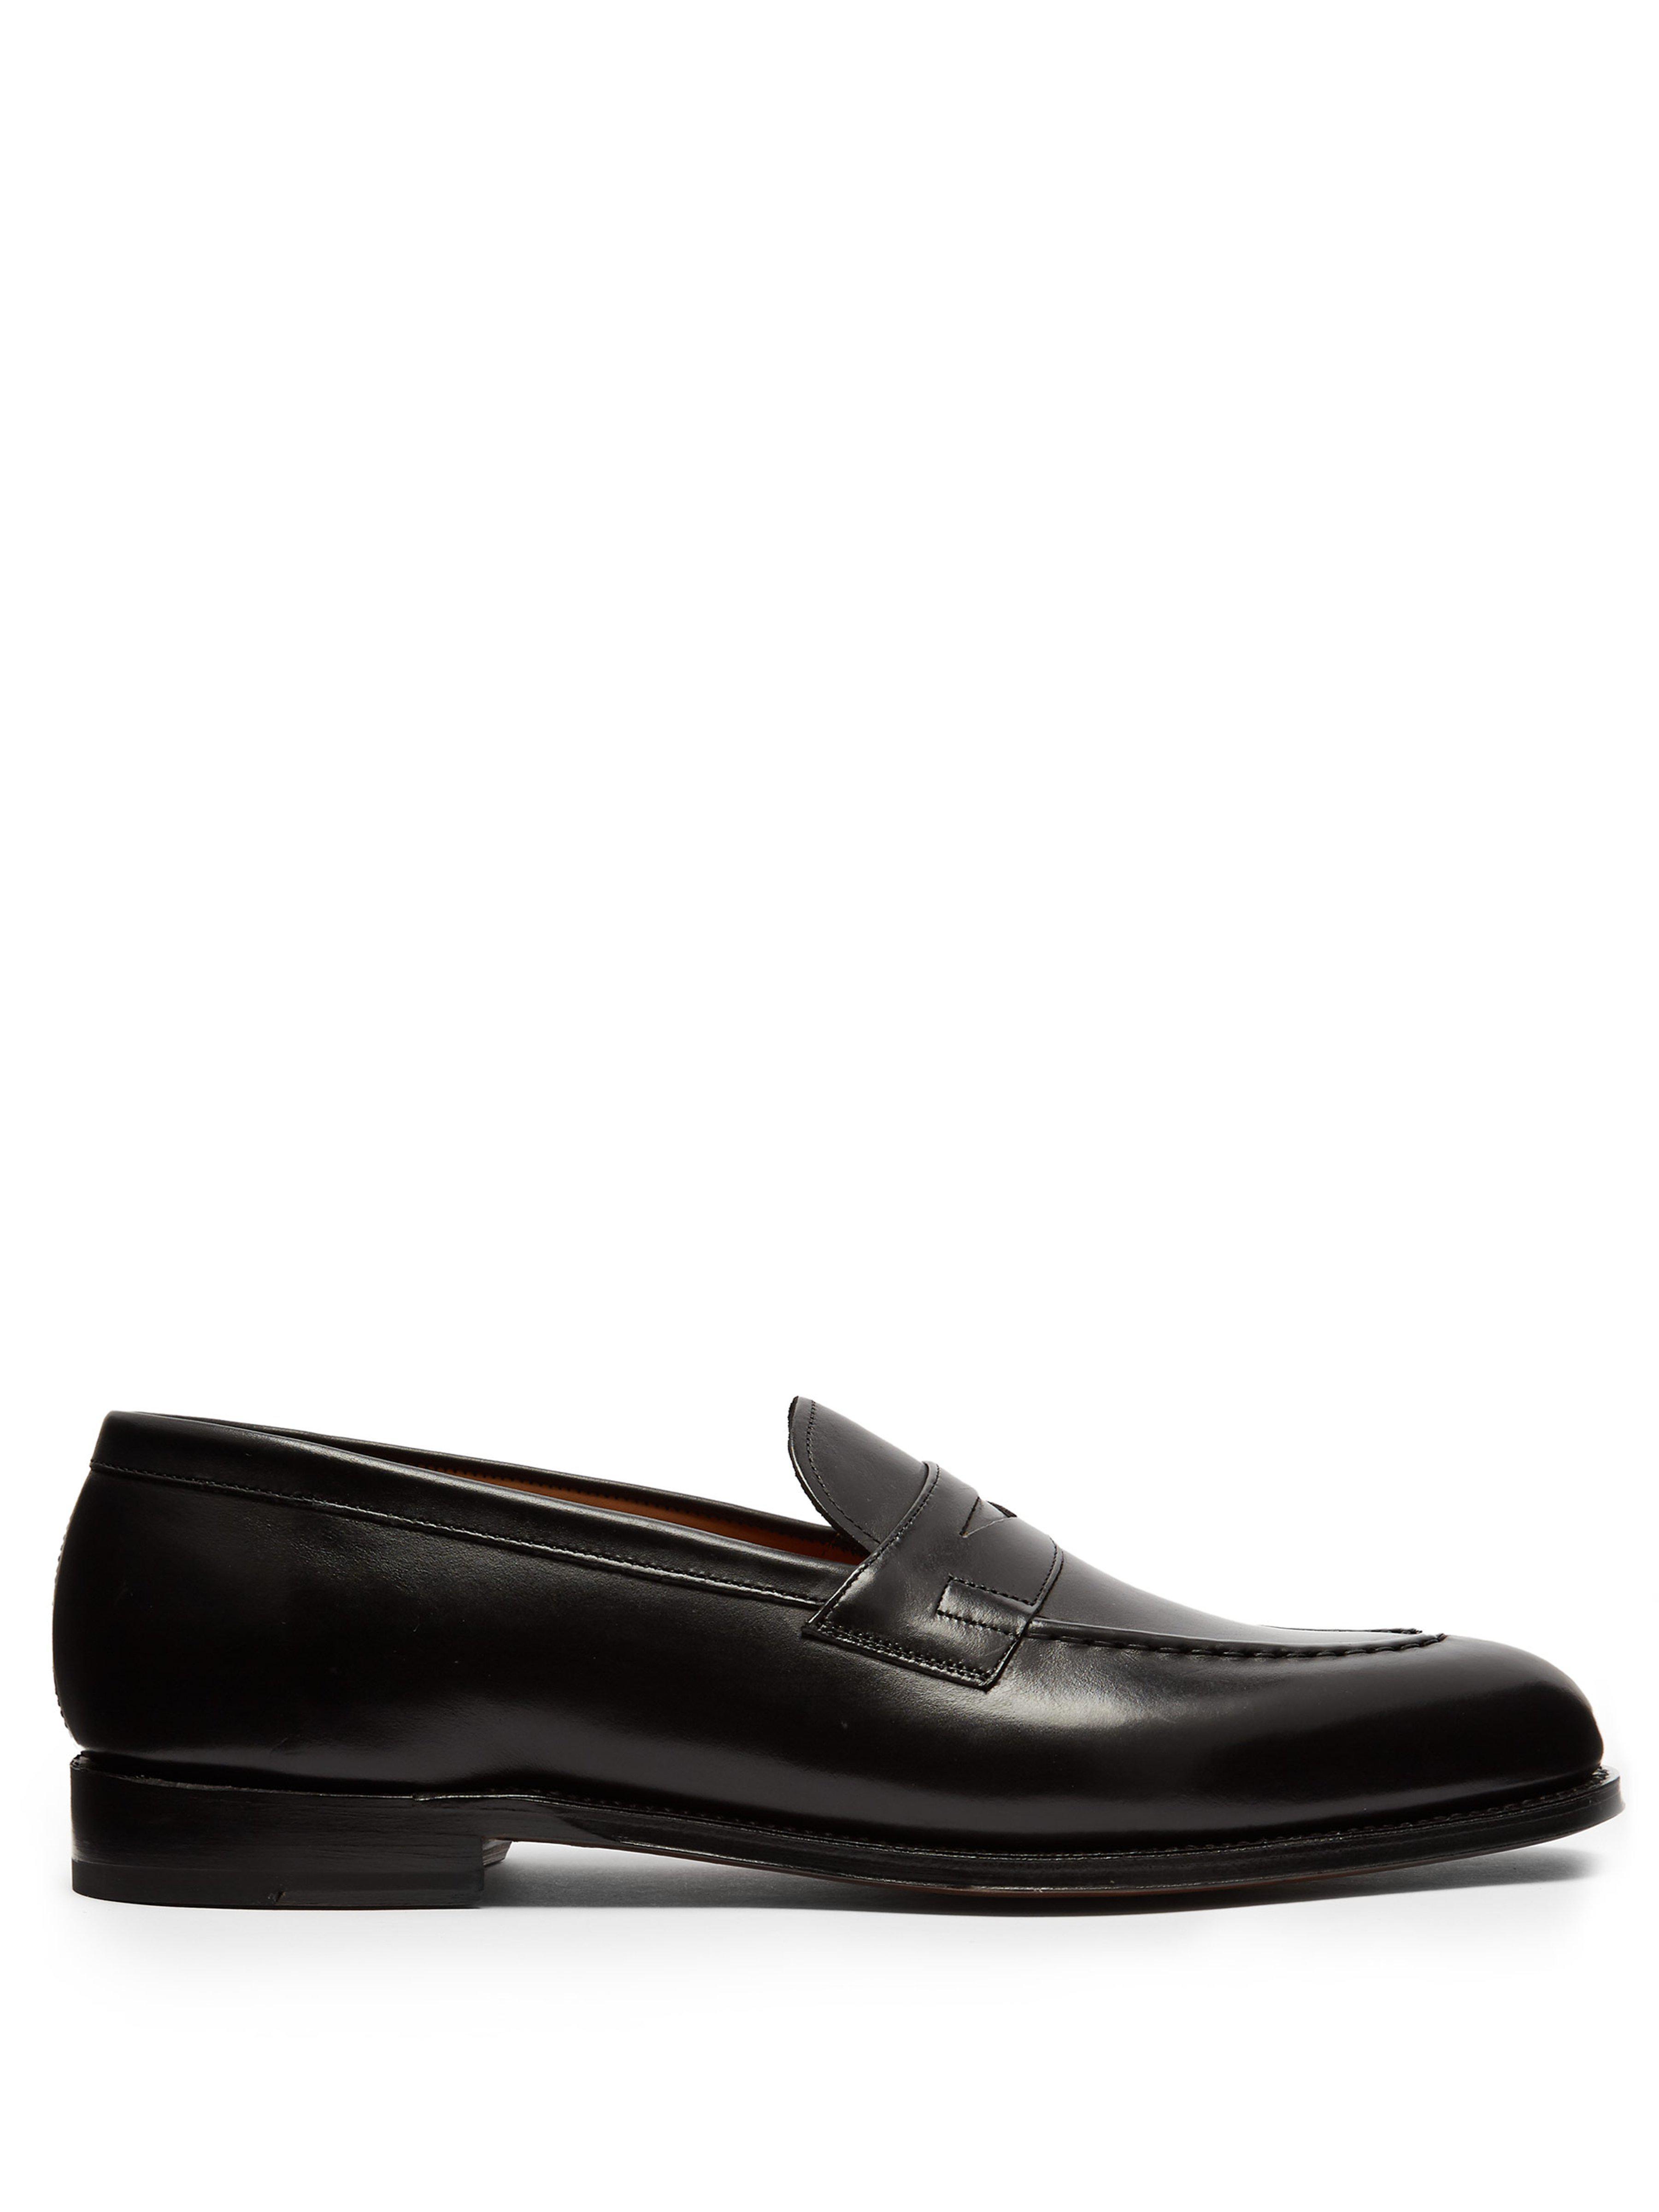 6e897dbde68 GRENSON - Black Lloyd Leather Penny Loafers for Men - Lyst. View fullscreen